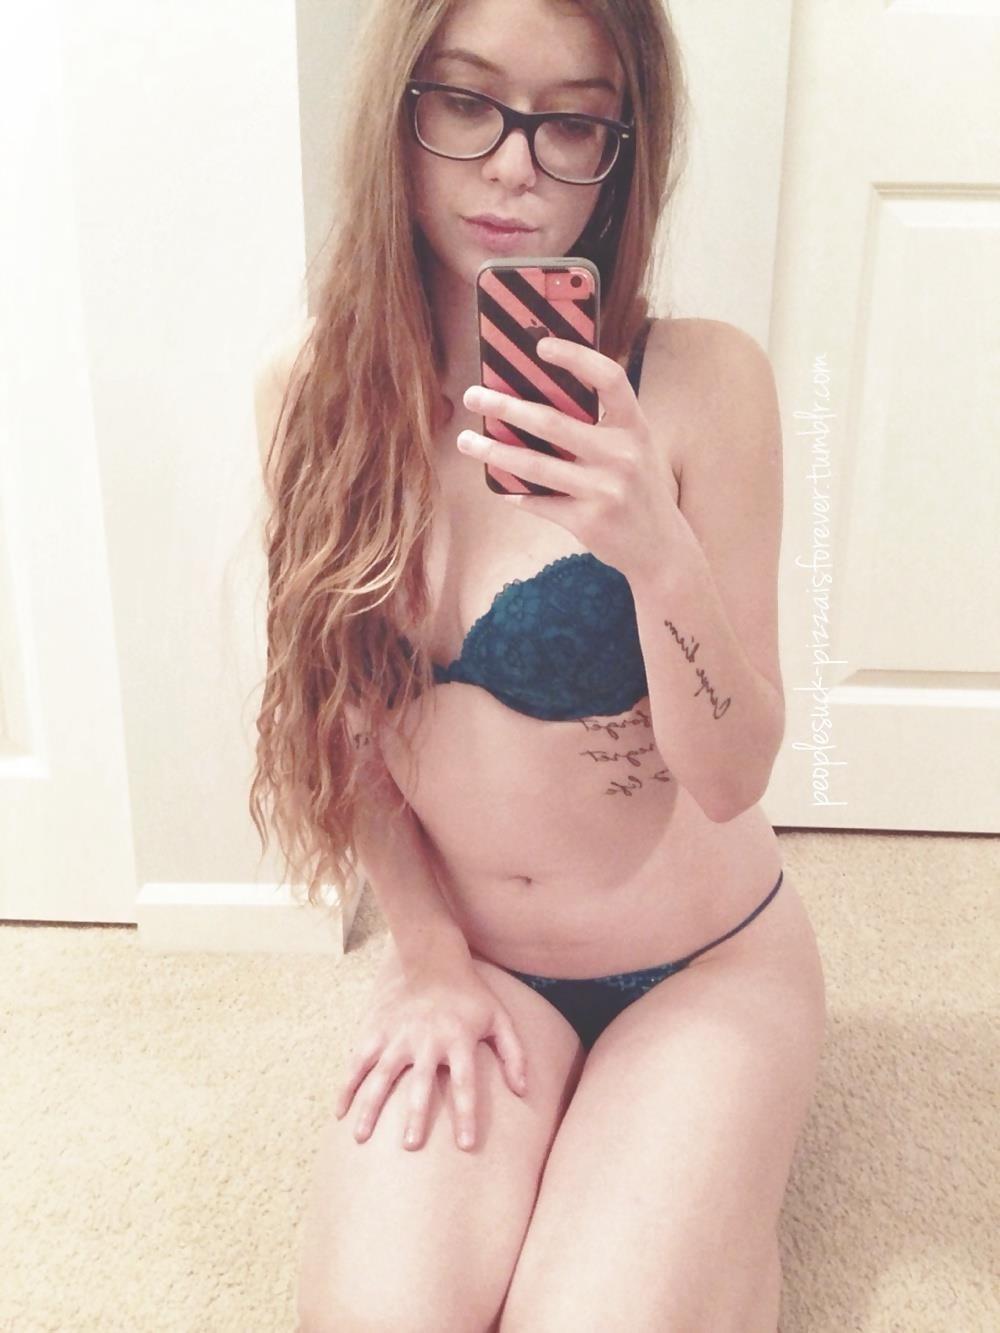 Hot amateur girls naked-2215